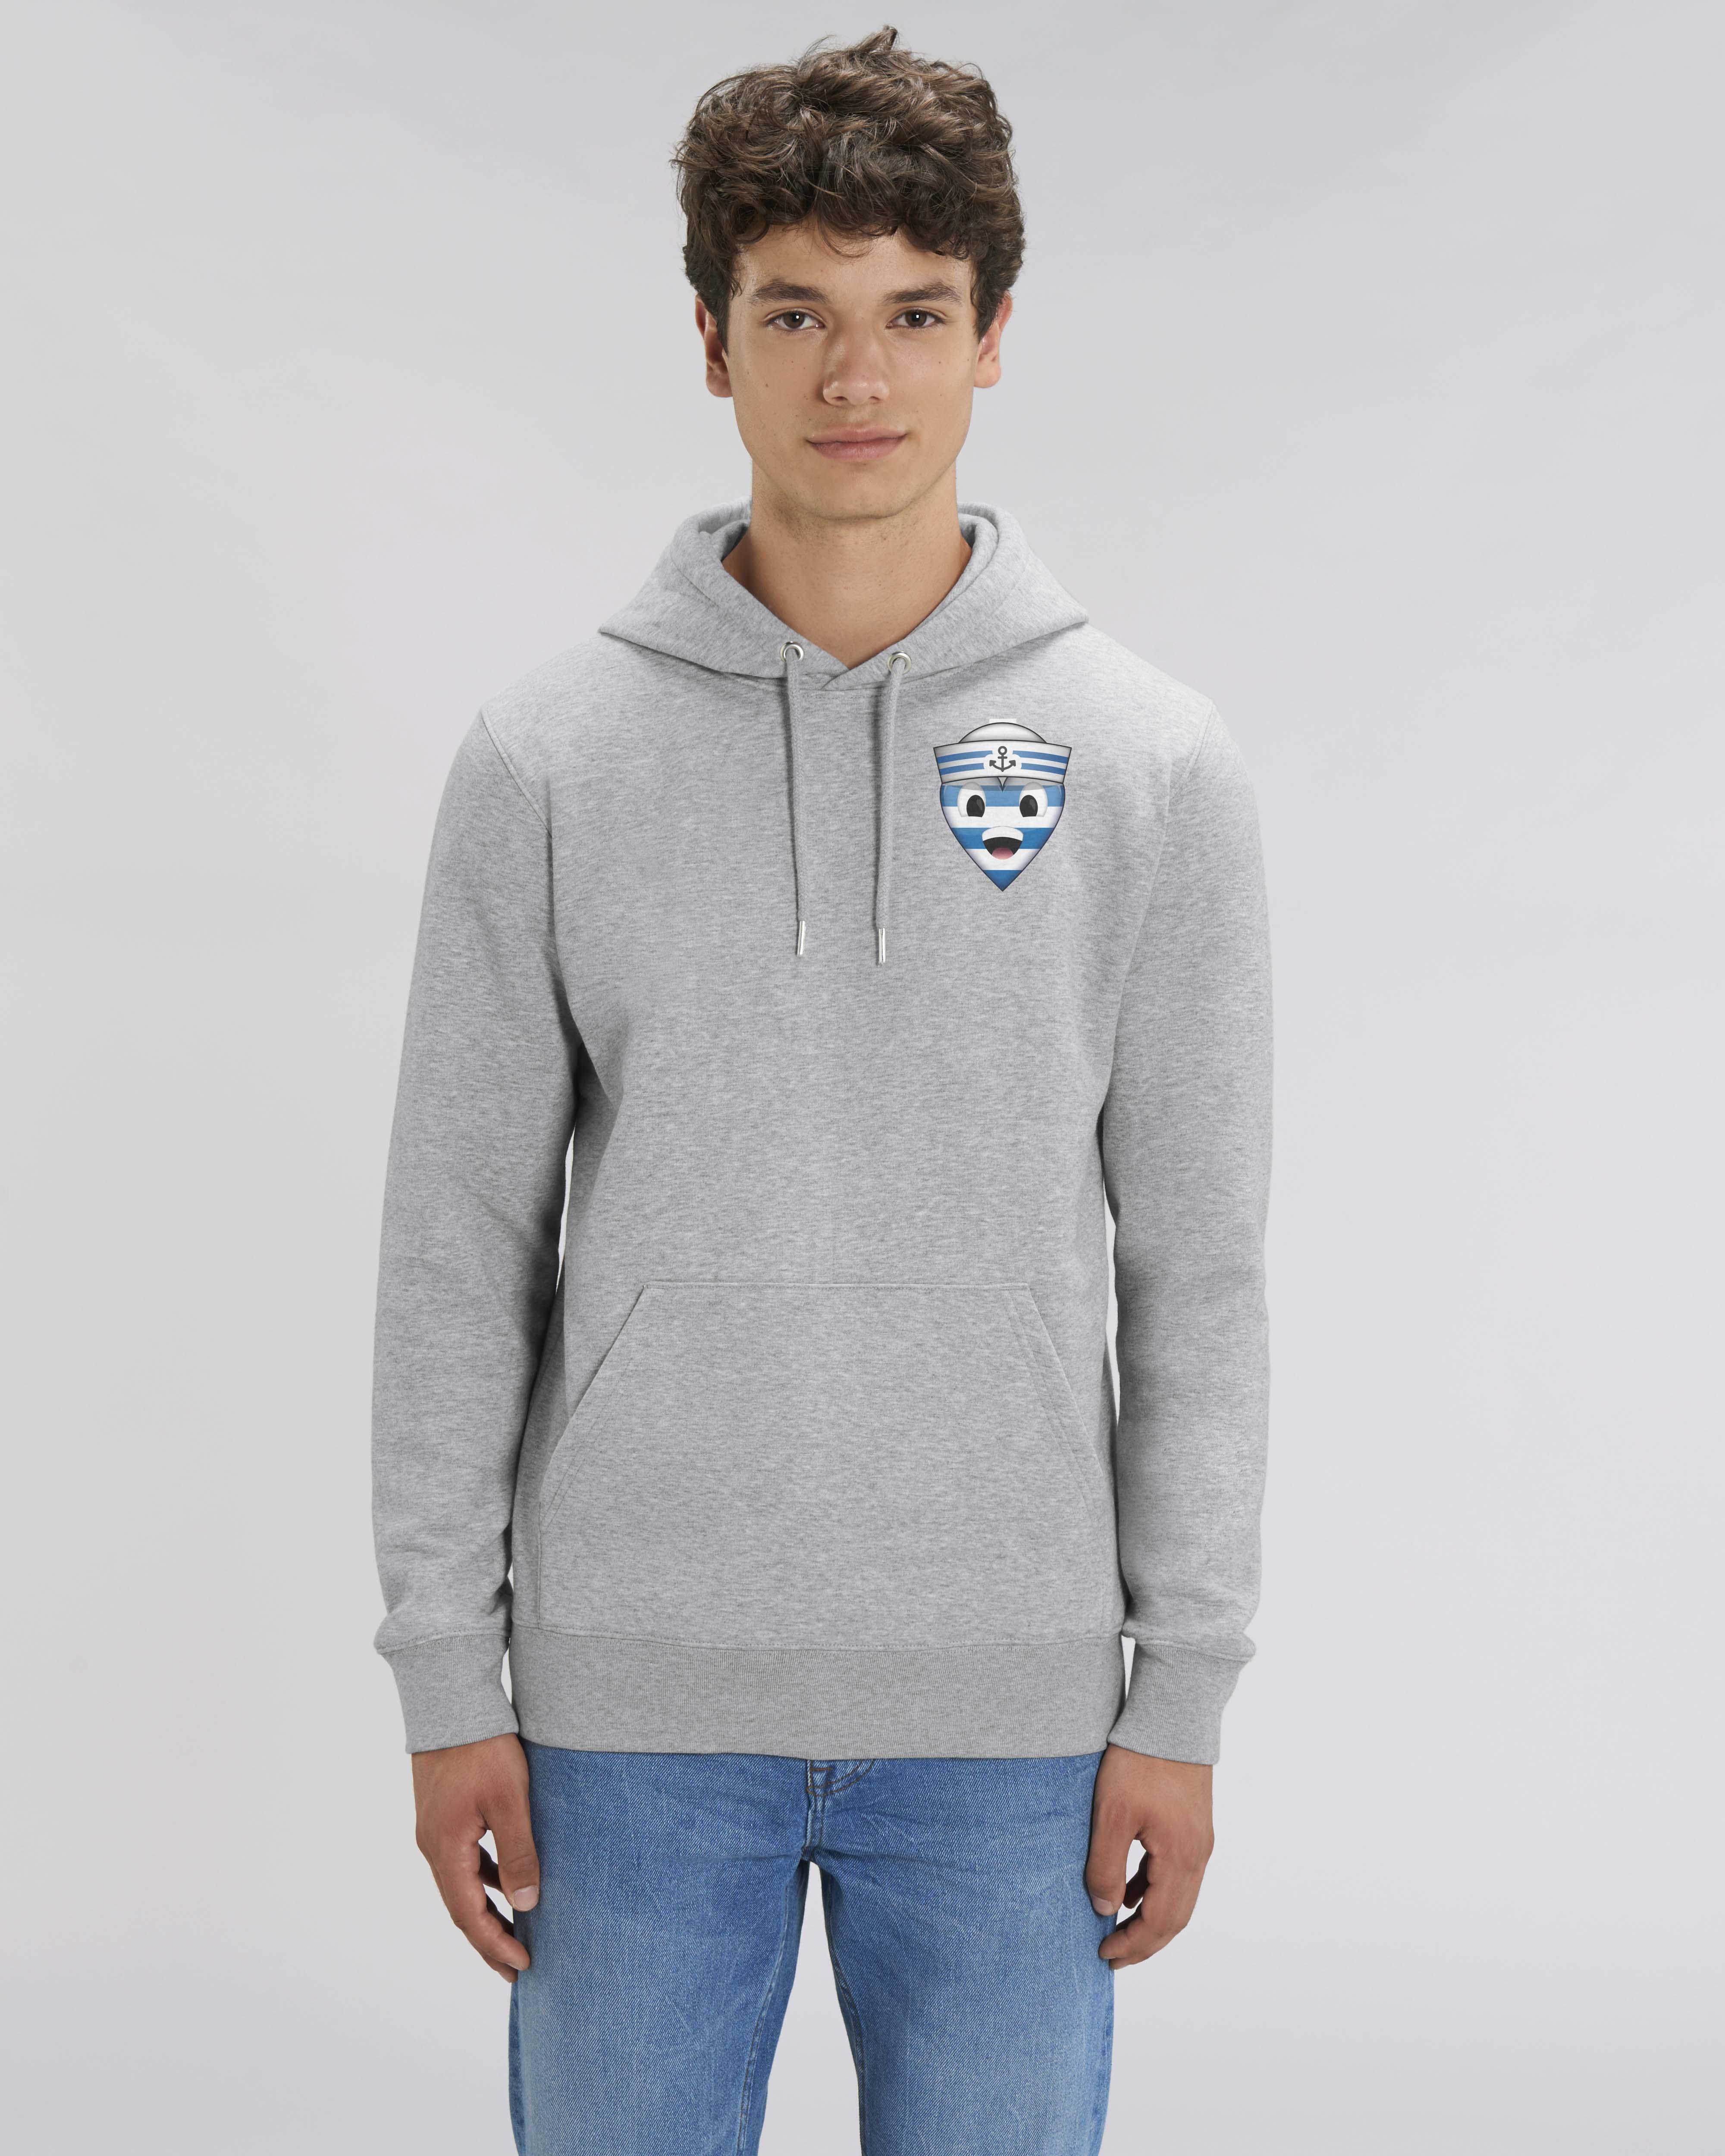 Sweat shirt à Capuche gris - navy hoodie